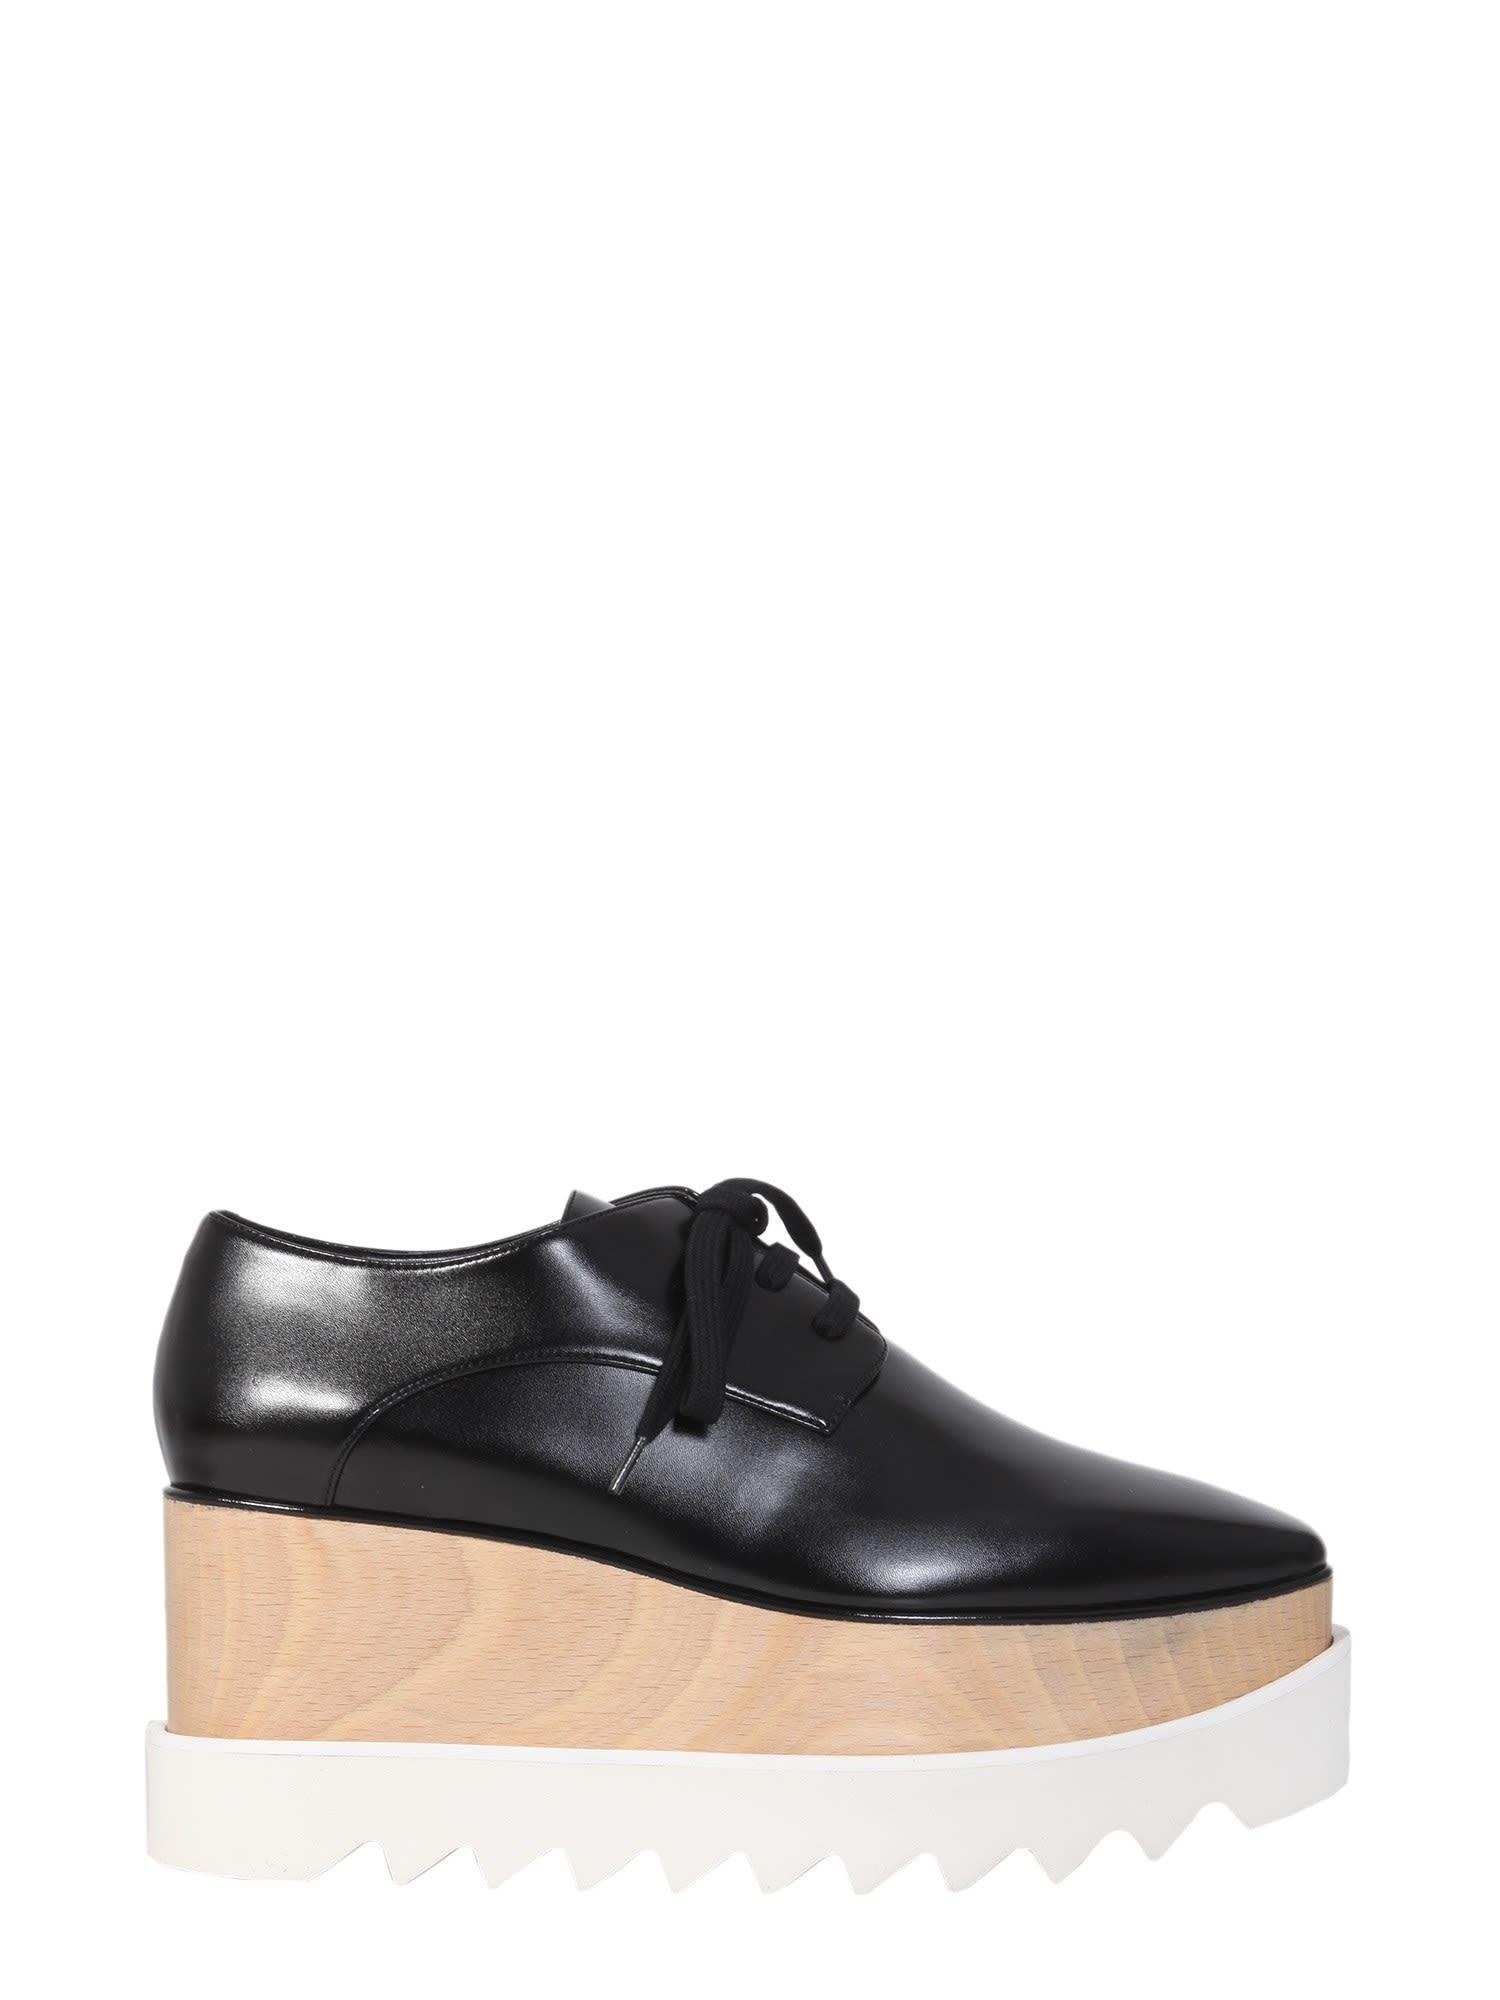 Elyse Lace Up Shoes